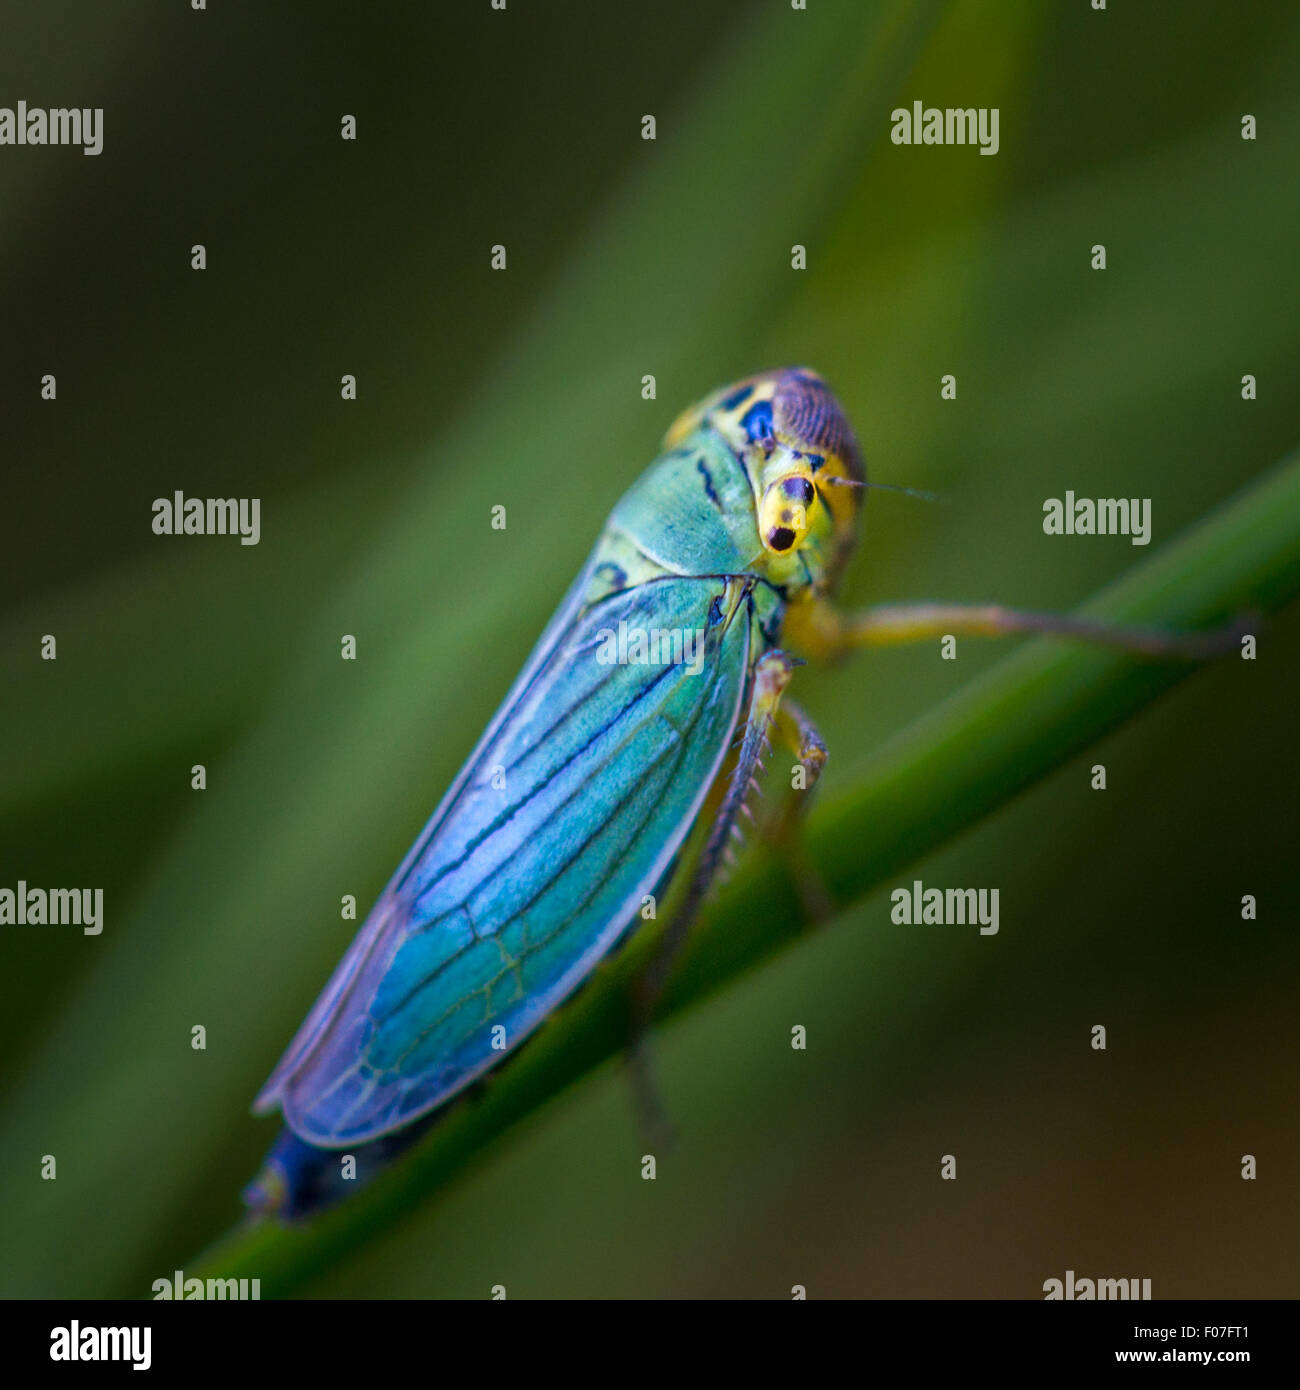 Grüne Leafhopper (Cicadella Viridis) - strahlende Fellow wenn nur ca. 7 mm lange im feuchten Grünland Stockbild